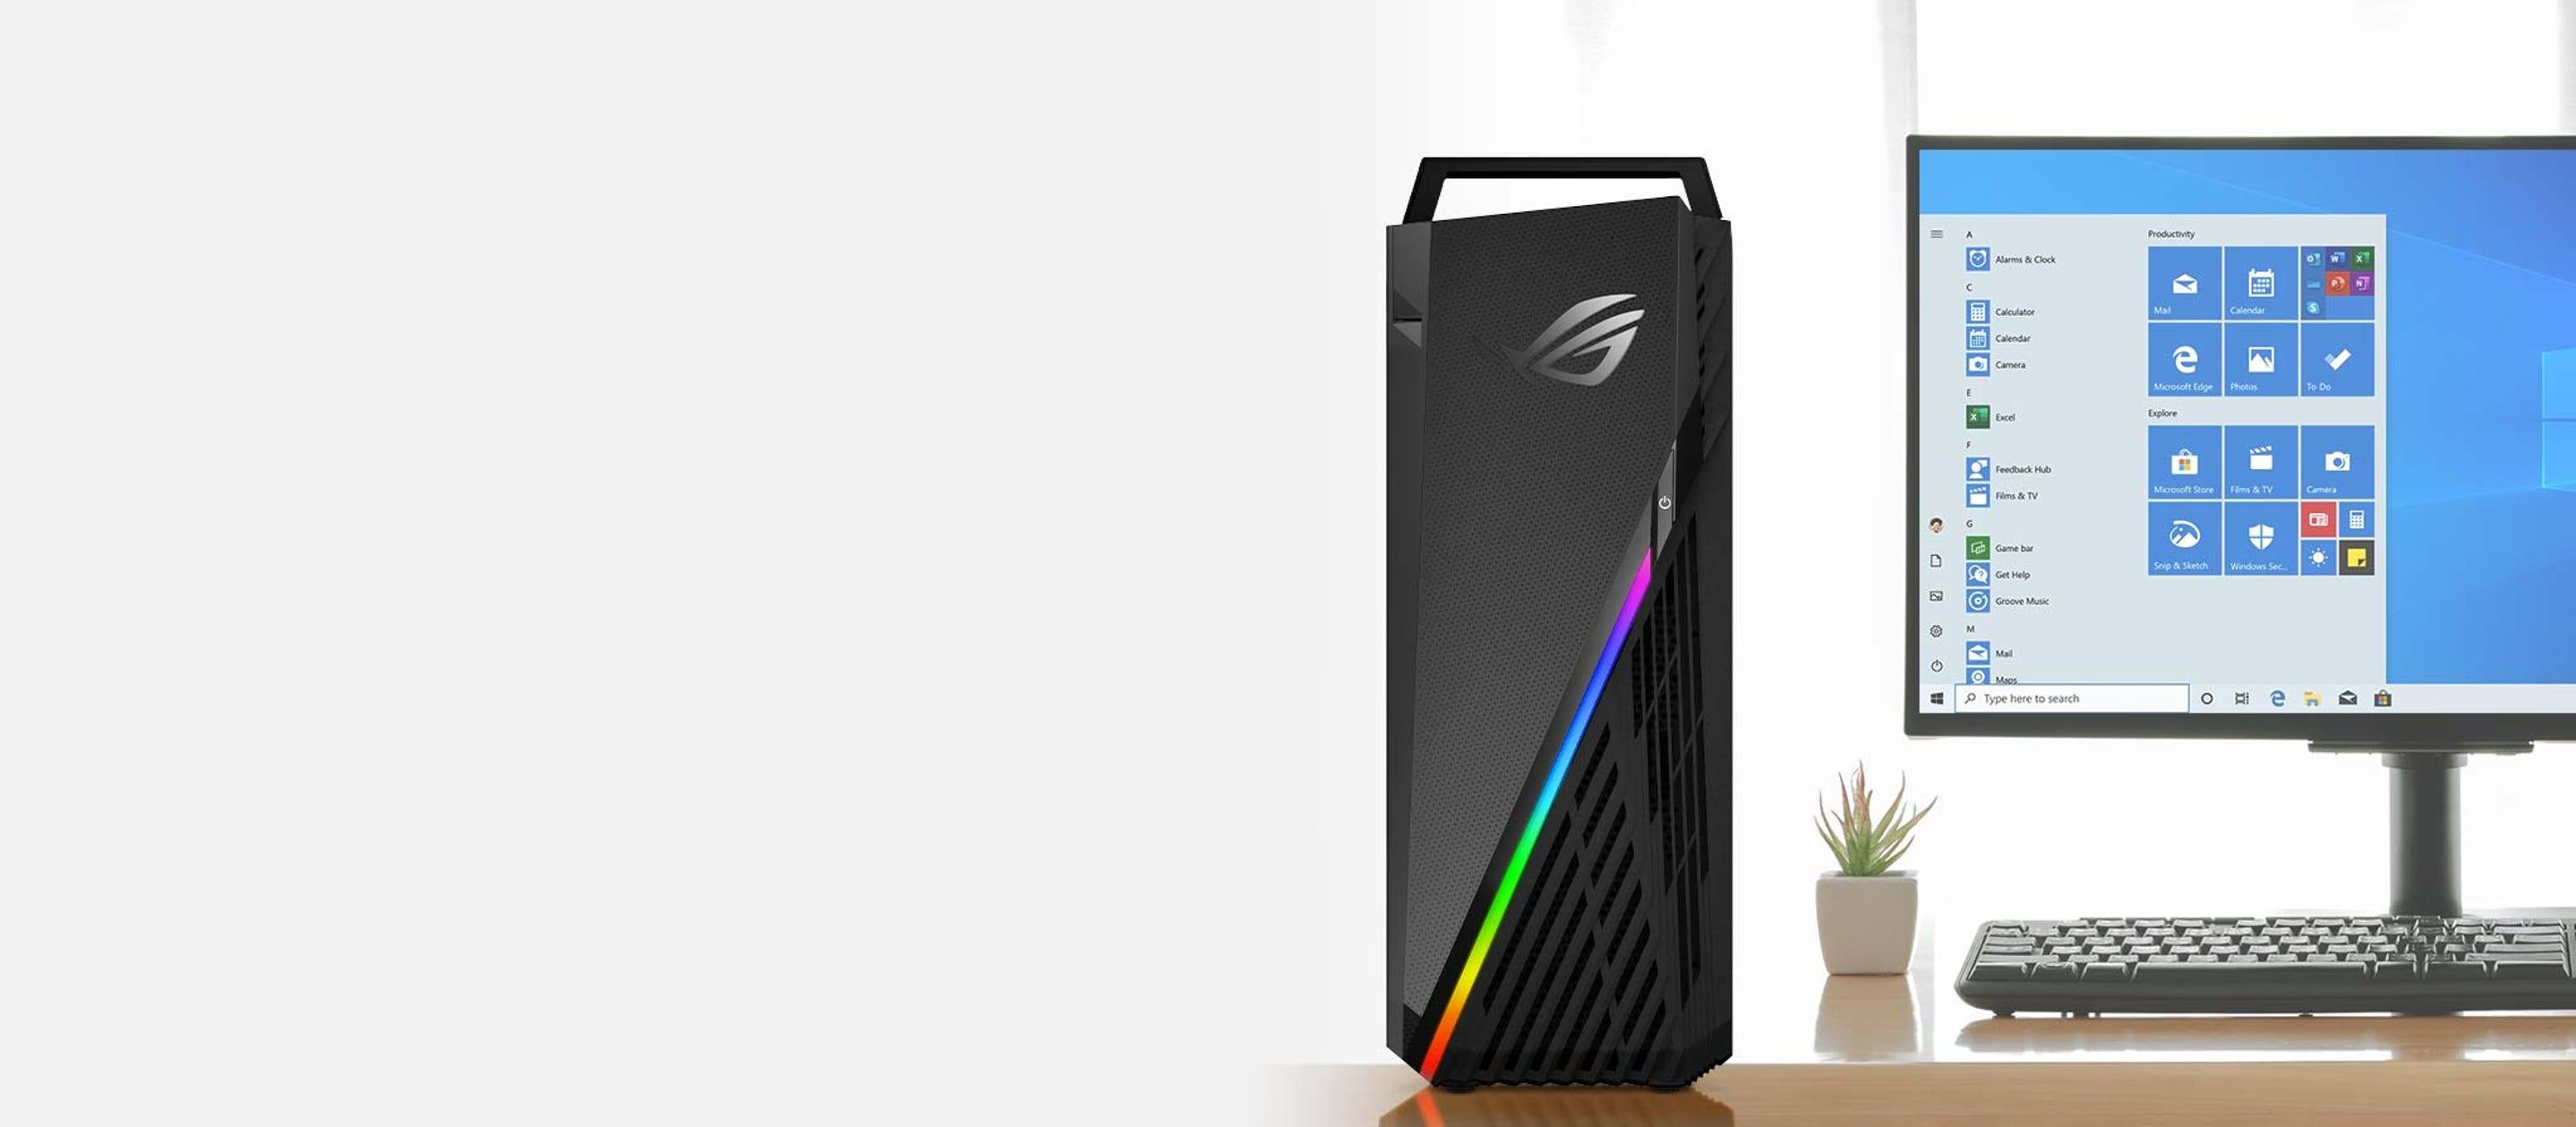 Desktop Computers Pcs Best Buy Canada